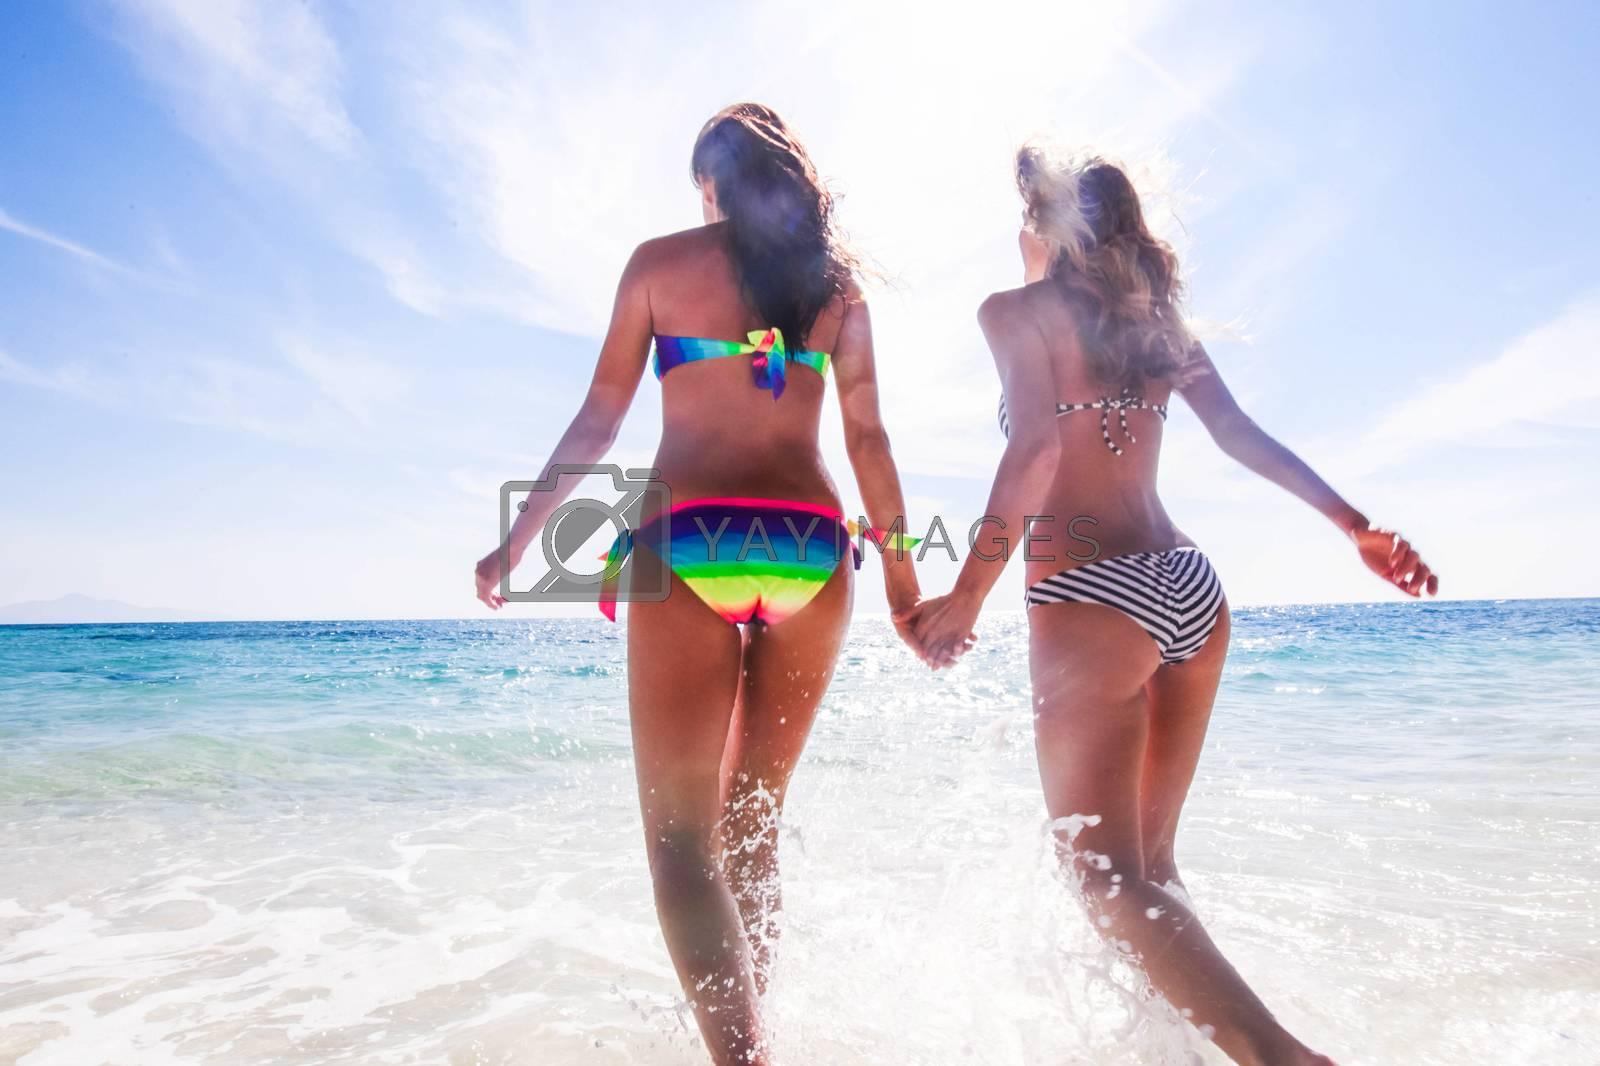 Beautiful fit women in bikni run on tropical beach to sea waves rear view